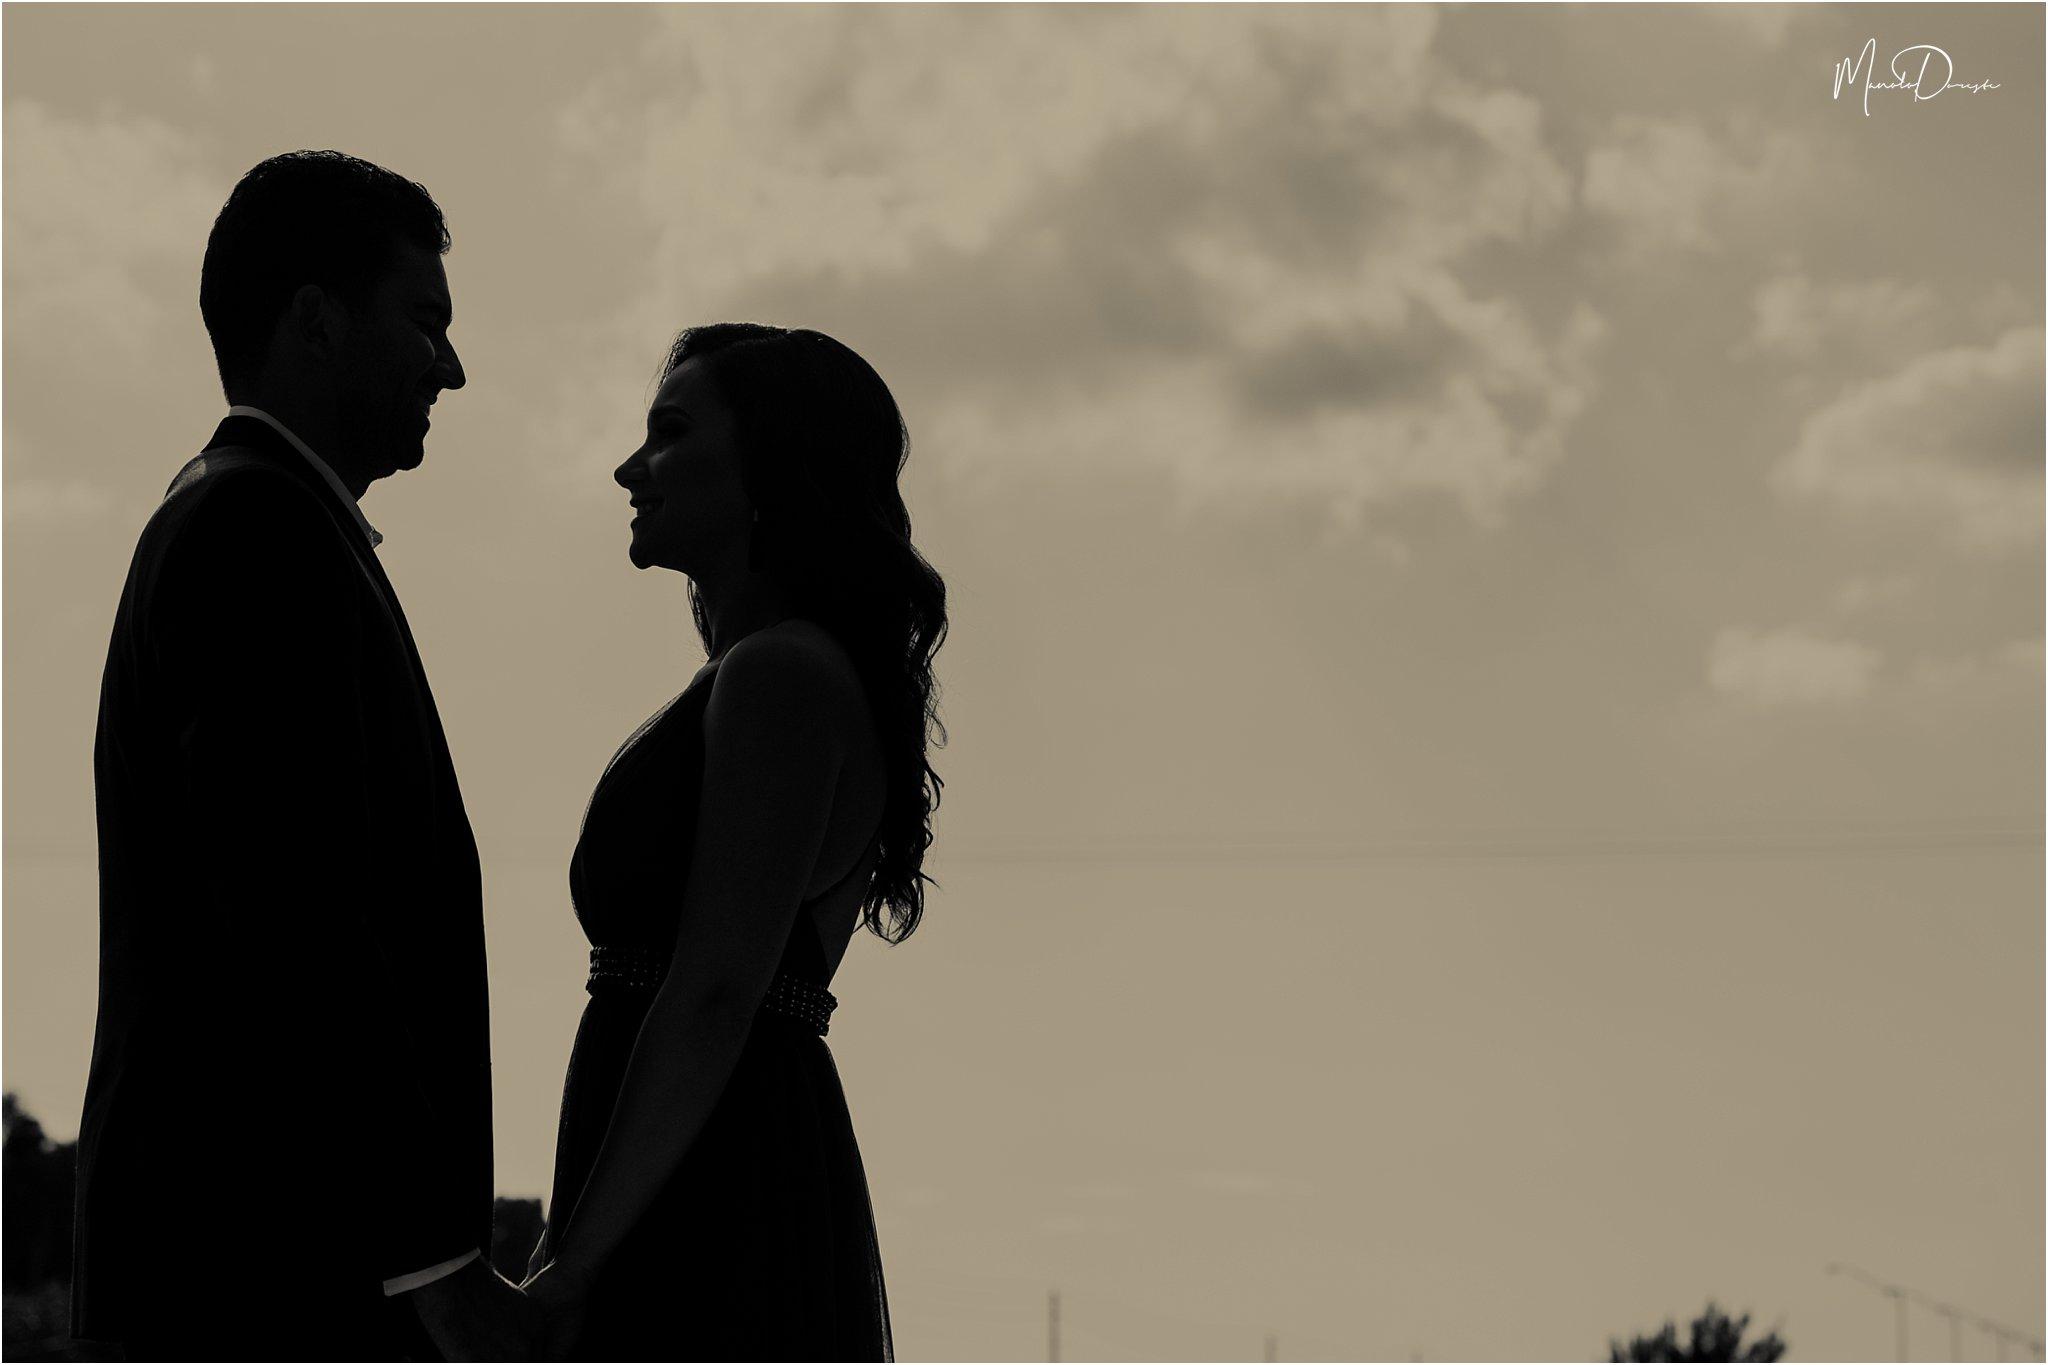 00812_ManoloDoreste_InFocusStudios_Wedding_Family_Photography_Miami_MiamiPhotographer.jpg